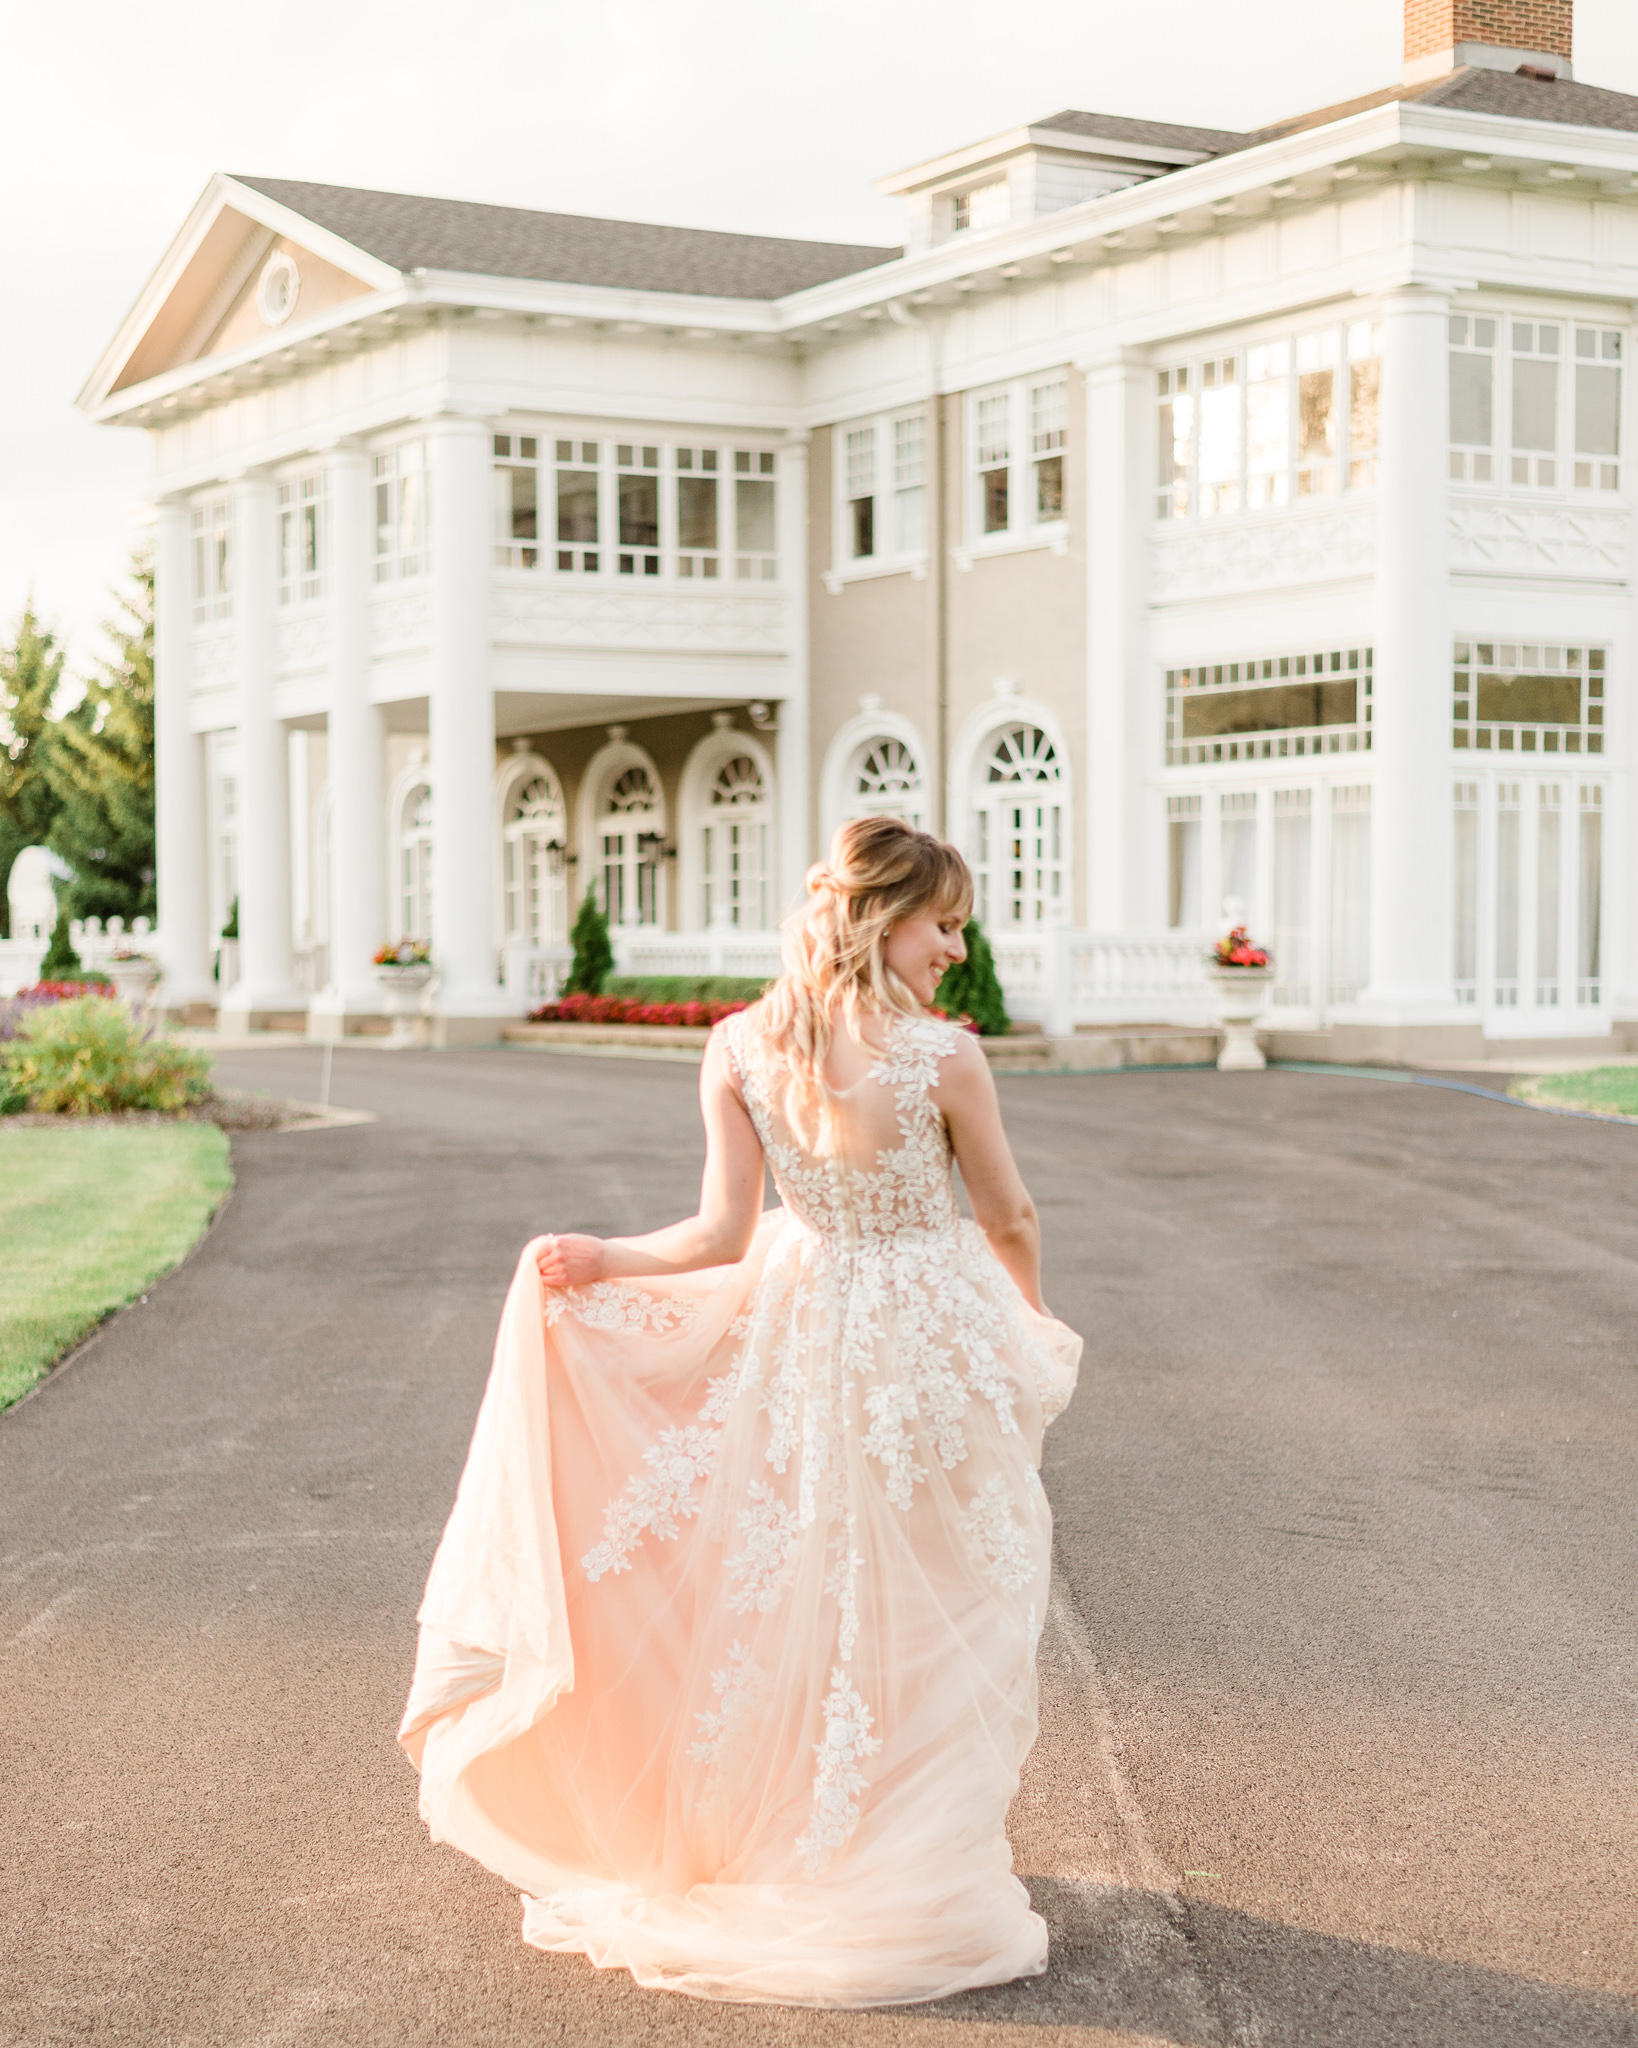 Lehmann-Mansion-Wedding-Inspiration-Joshua-Harrison-Photography–7761